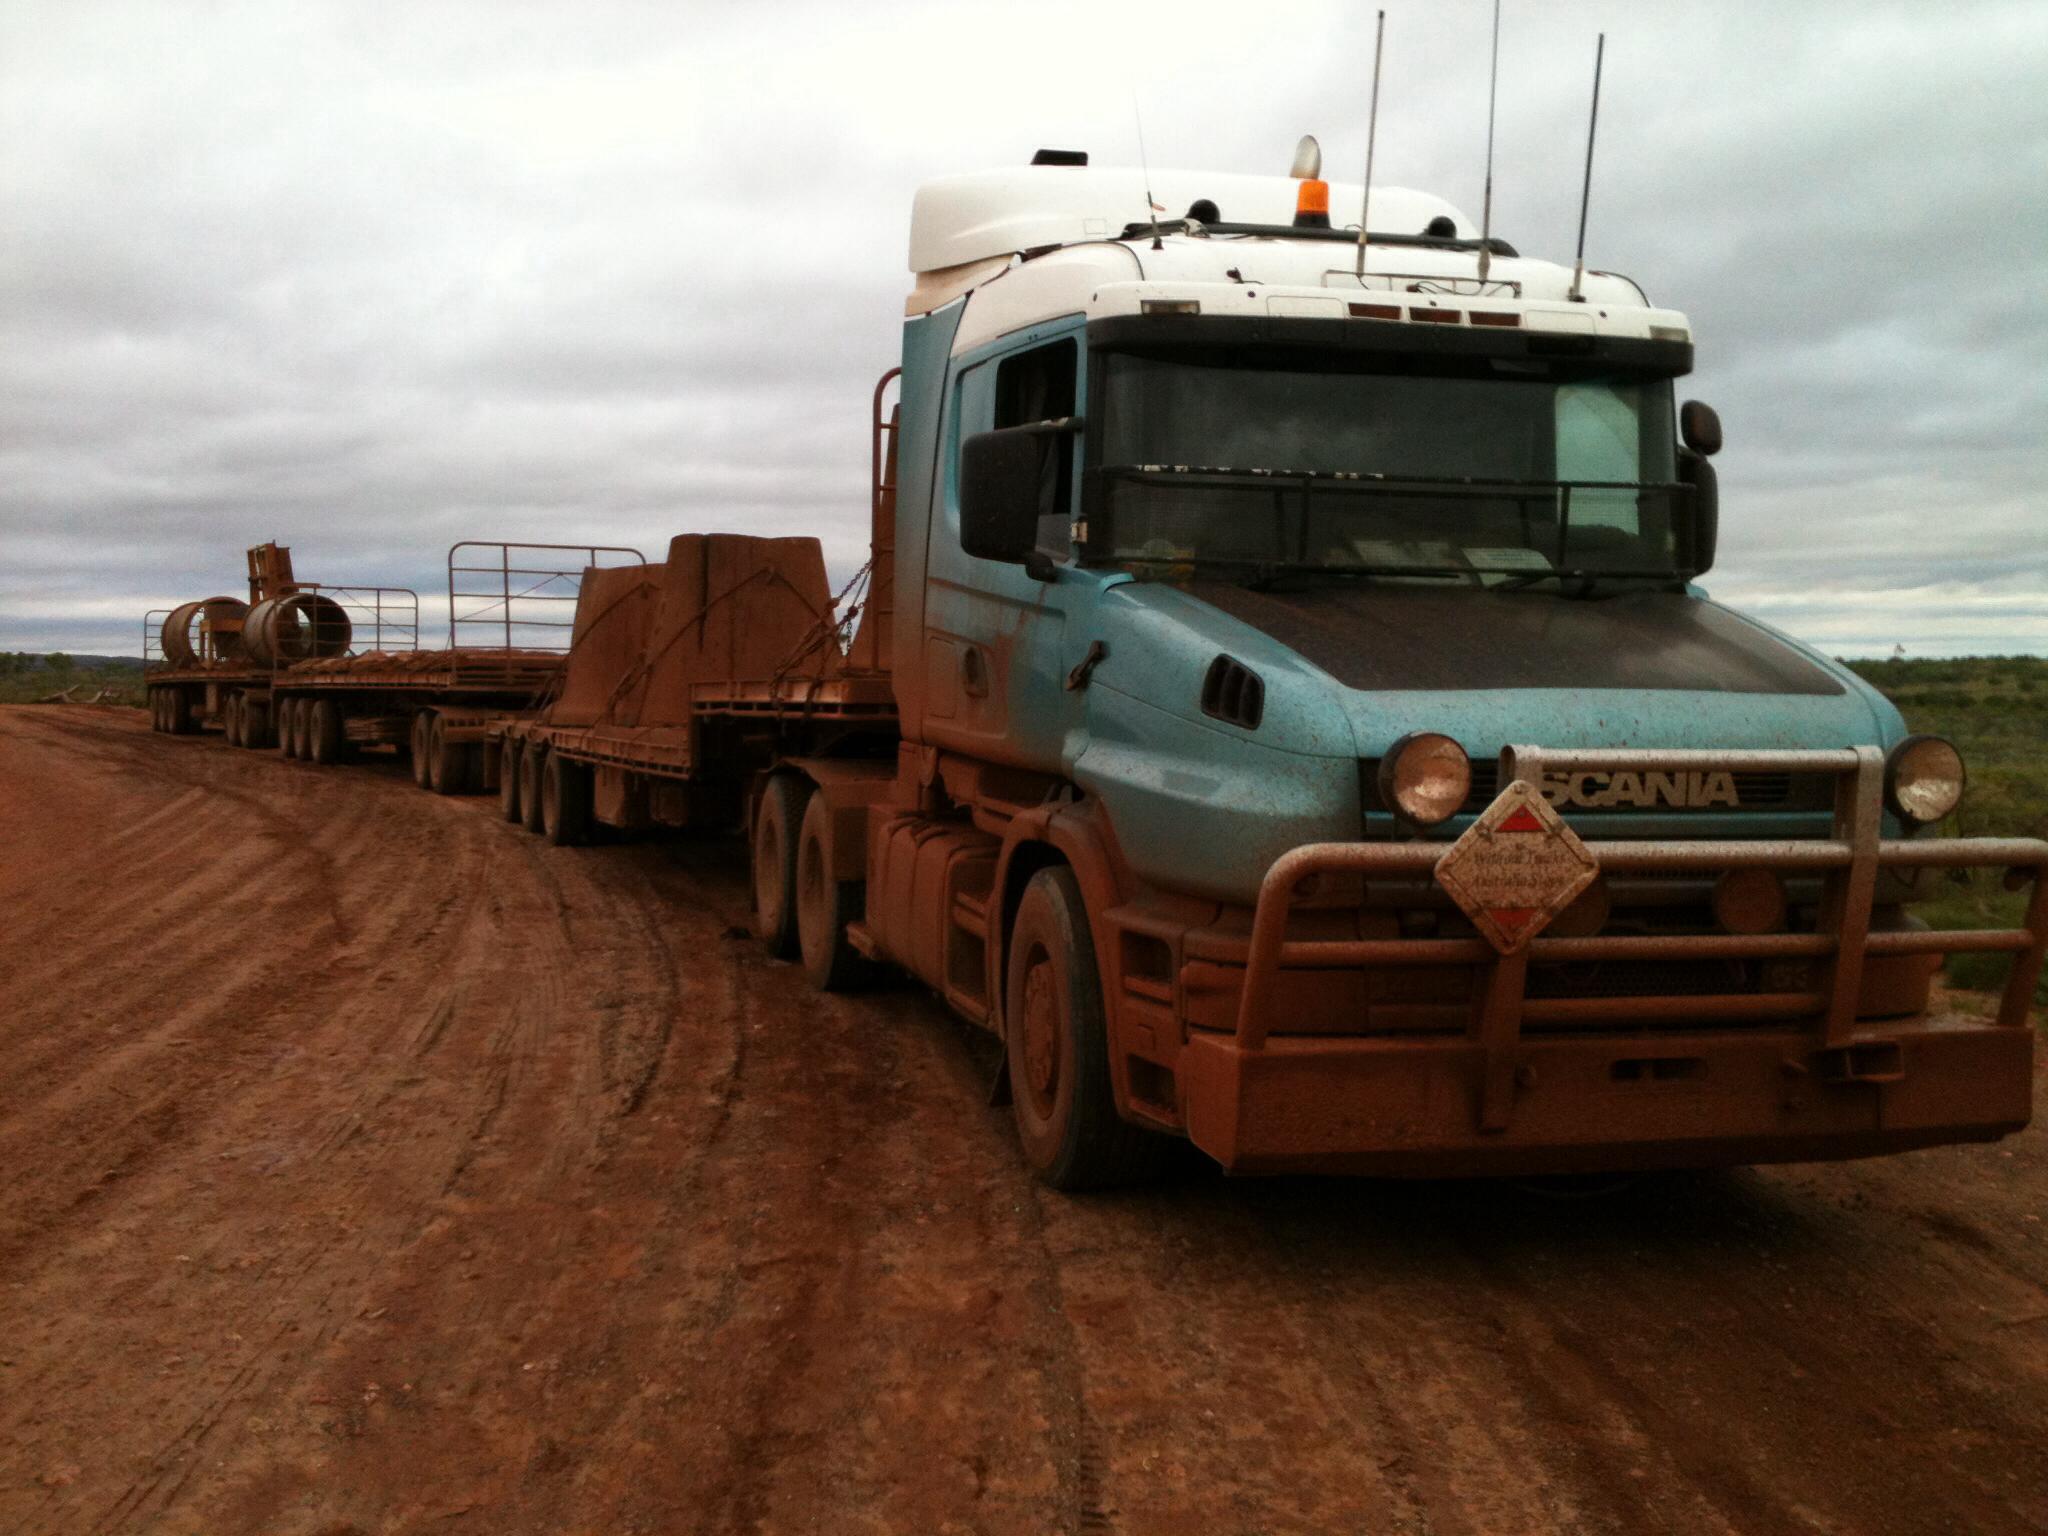 Scania-Australia